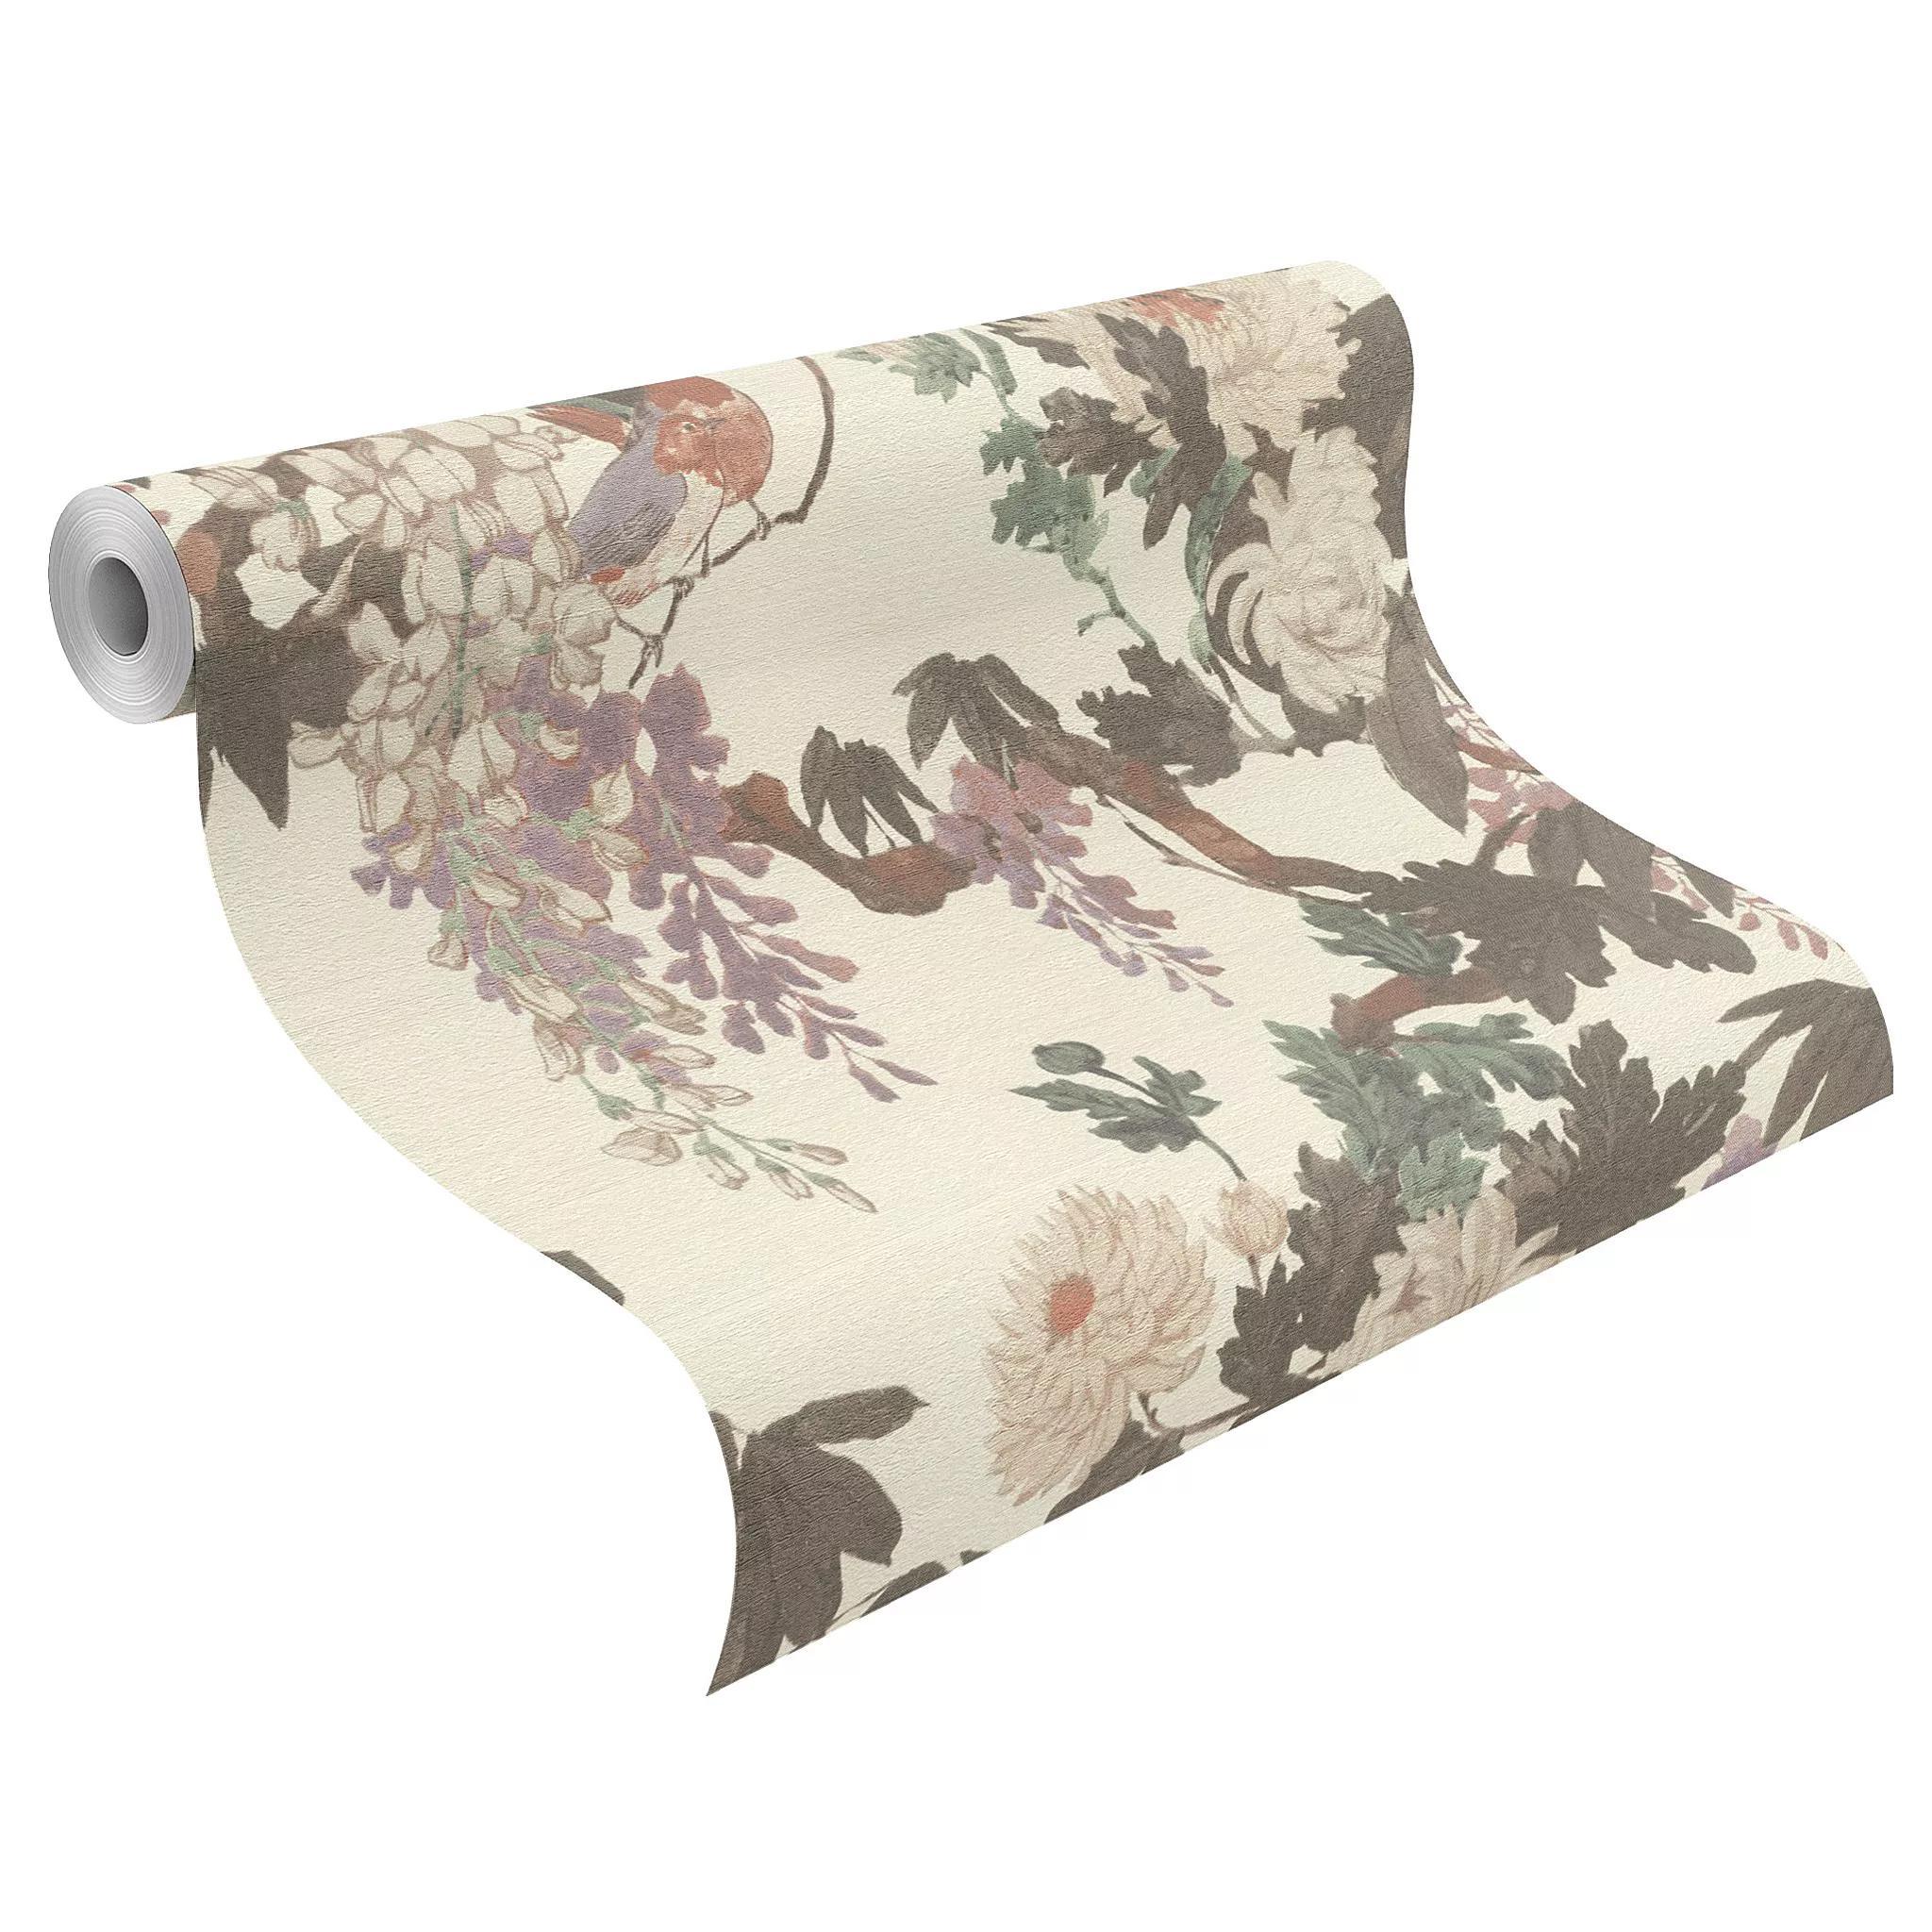 70cm-es luxus tapéta klasszikus virág madár mintával